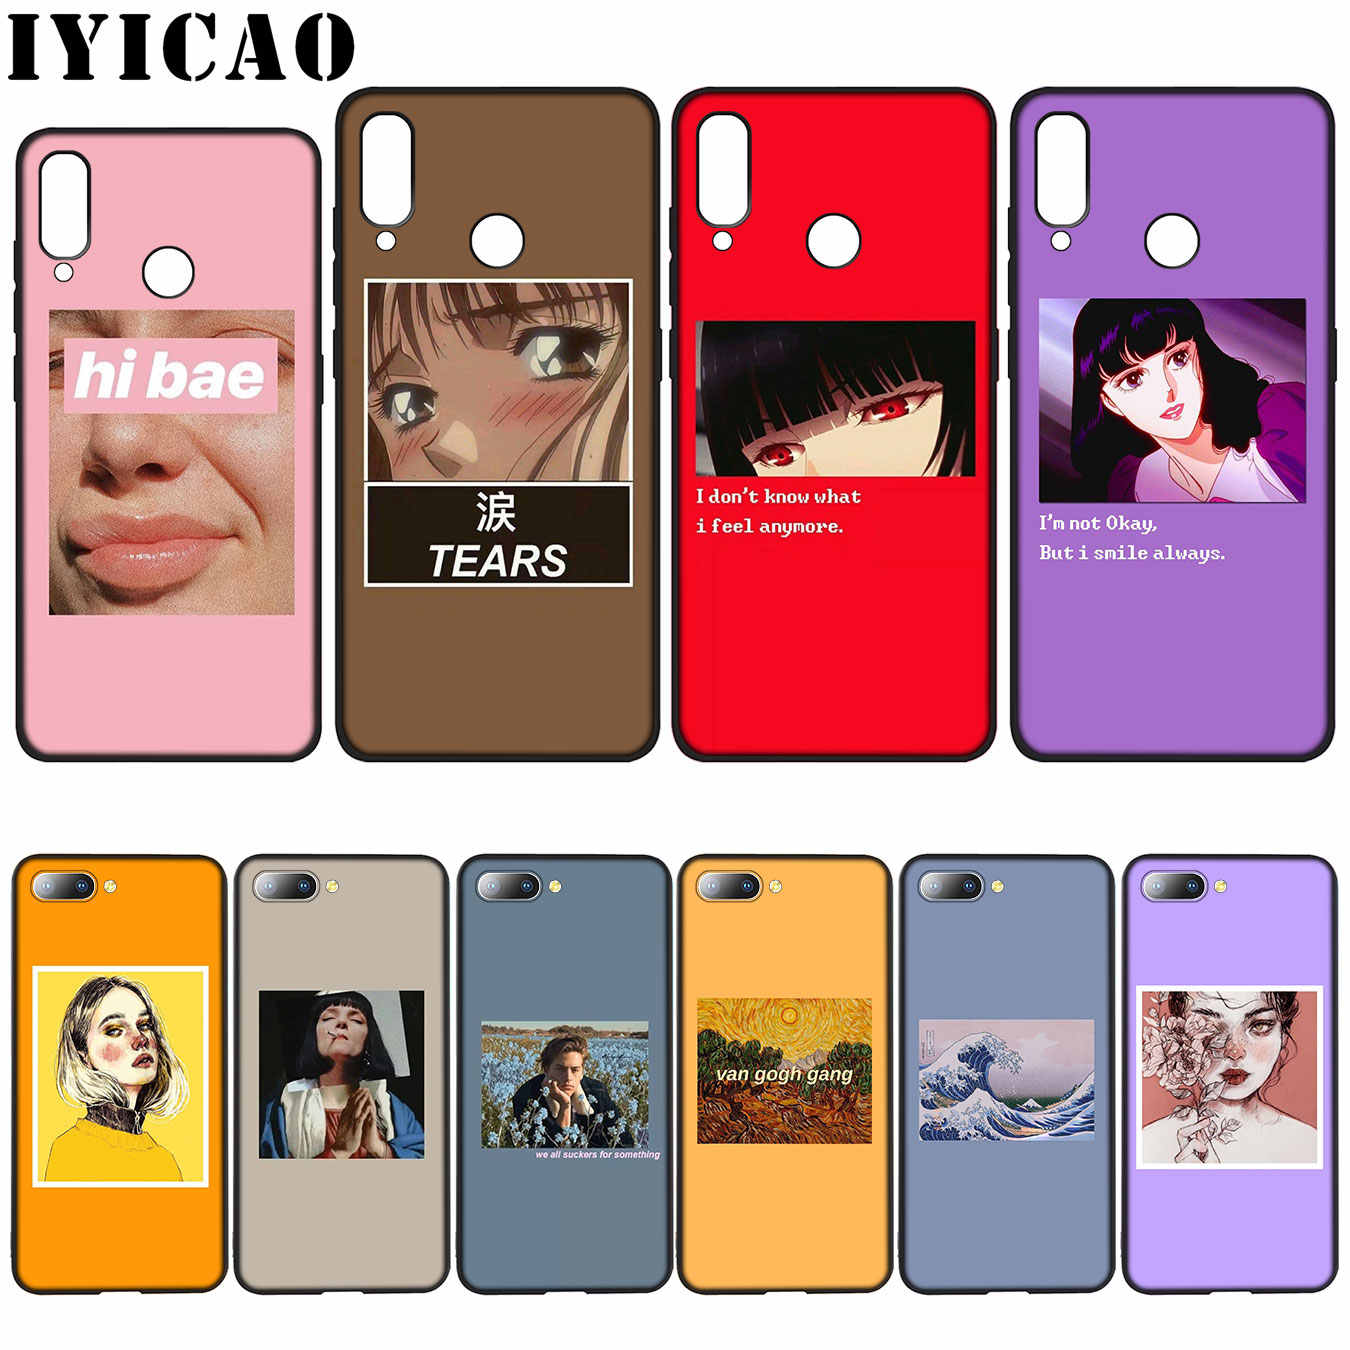 Great art aesthetic van Gogh Mona Lisa David Soft Case for Huawei Y7 Y6 Prime Y9 2018 Honor 8C 8X 8 9 10 Lite 7C 7X 7A Pro